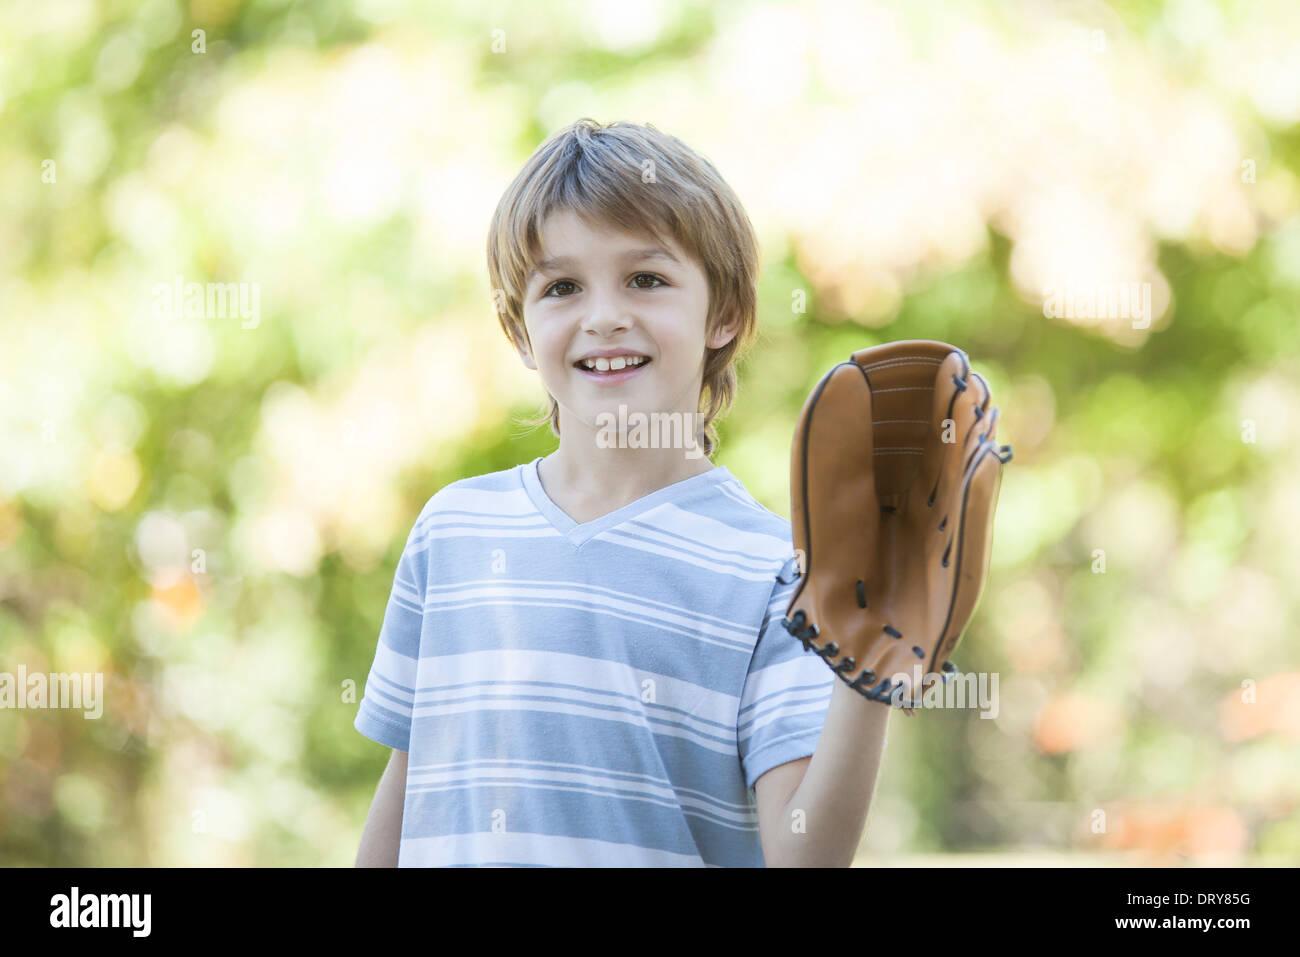 Boy wearing baseball glove - Stock Image